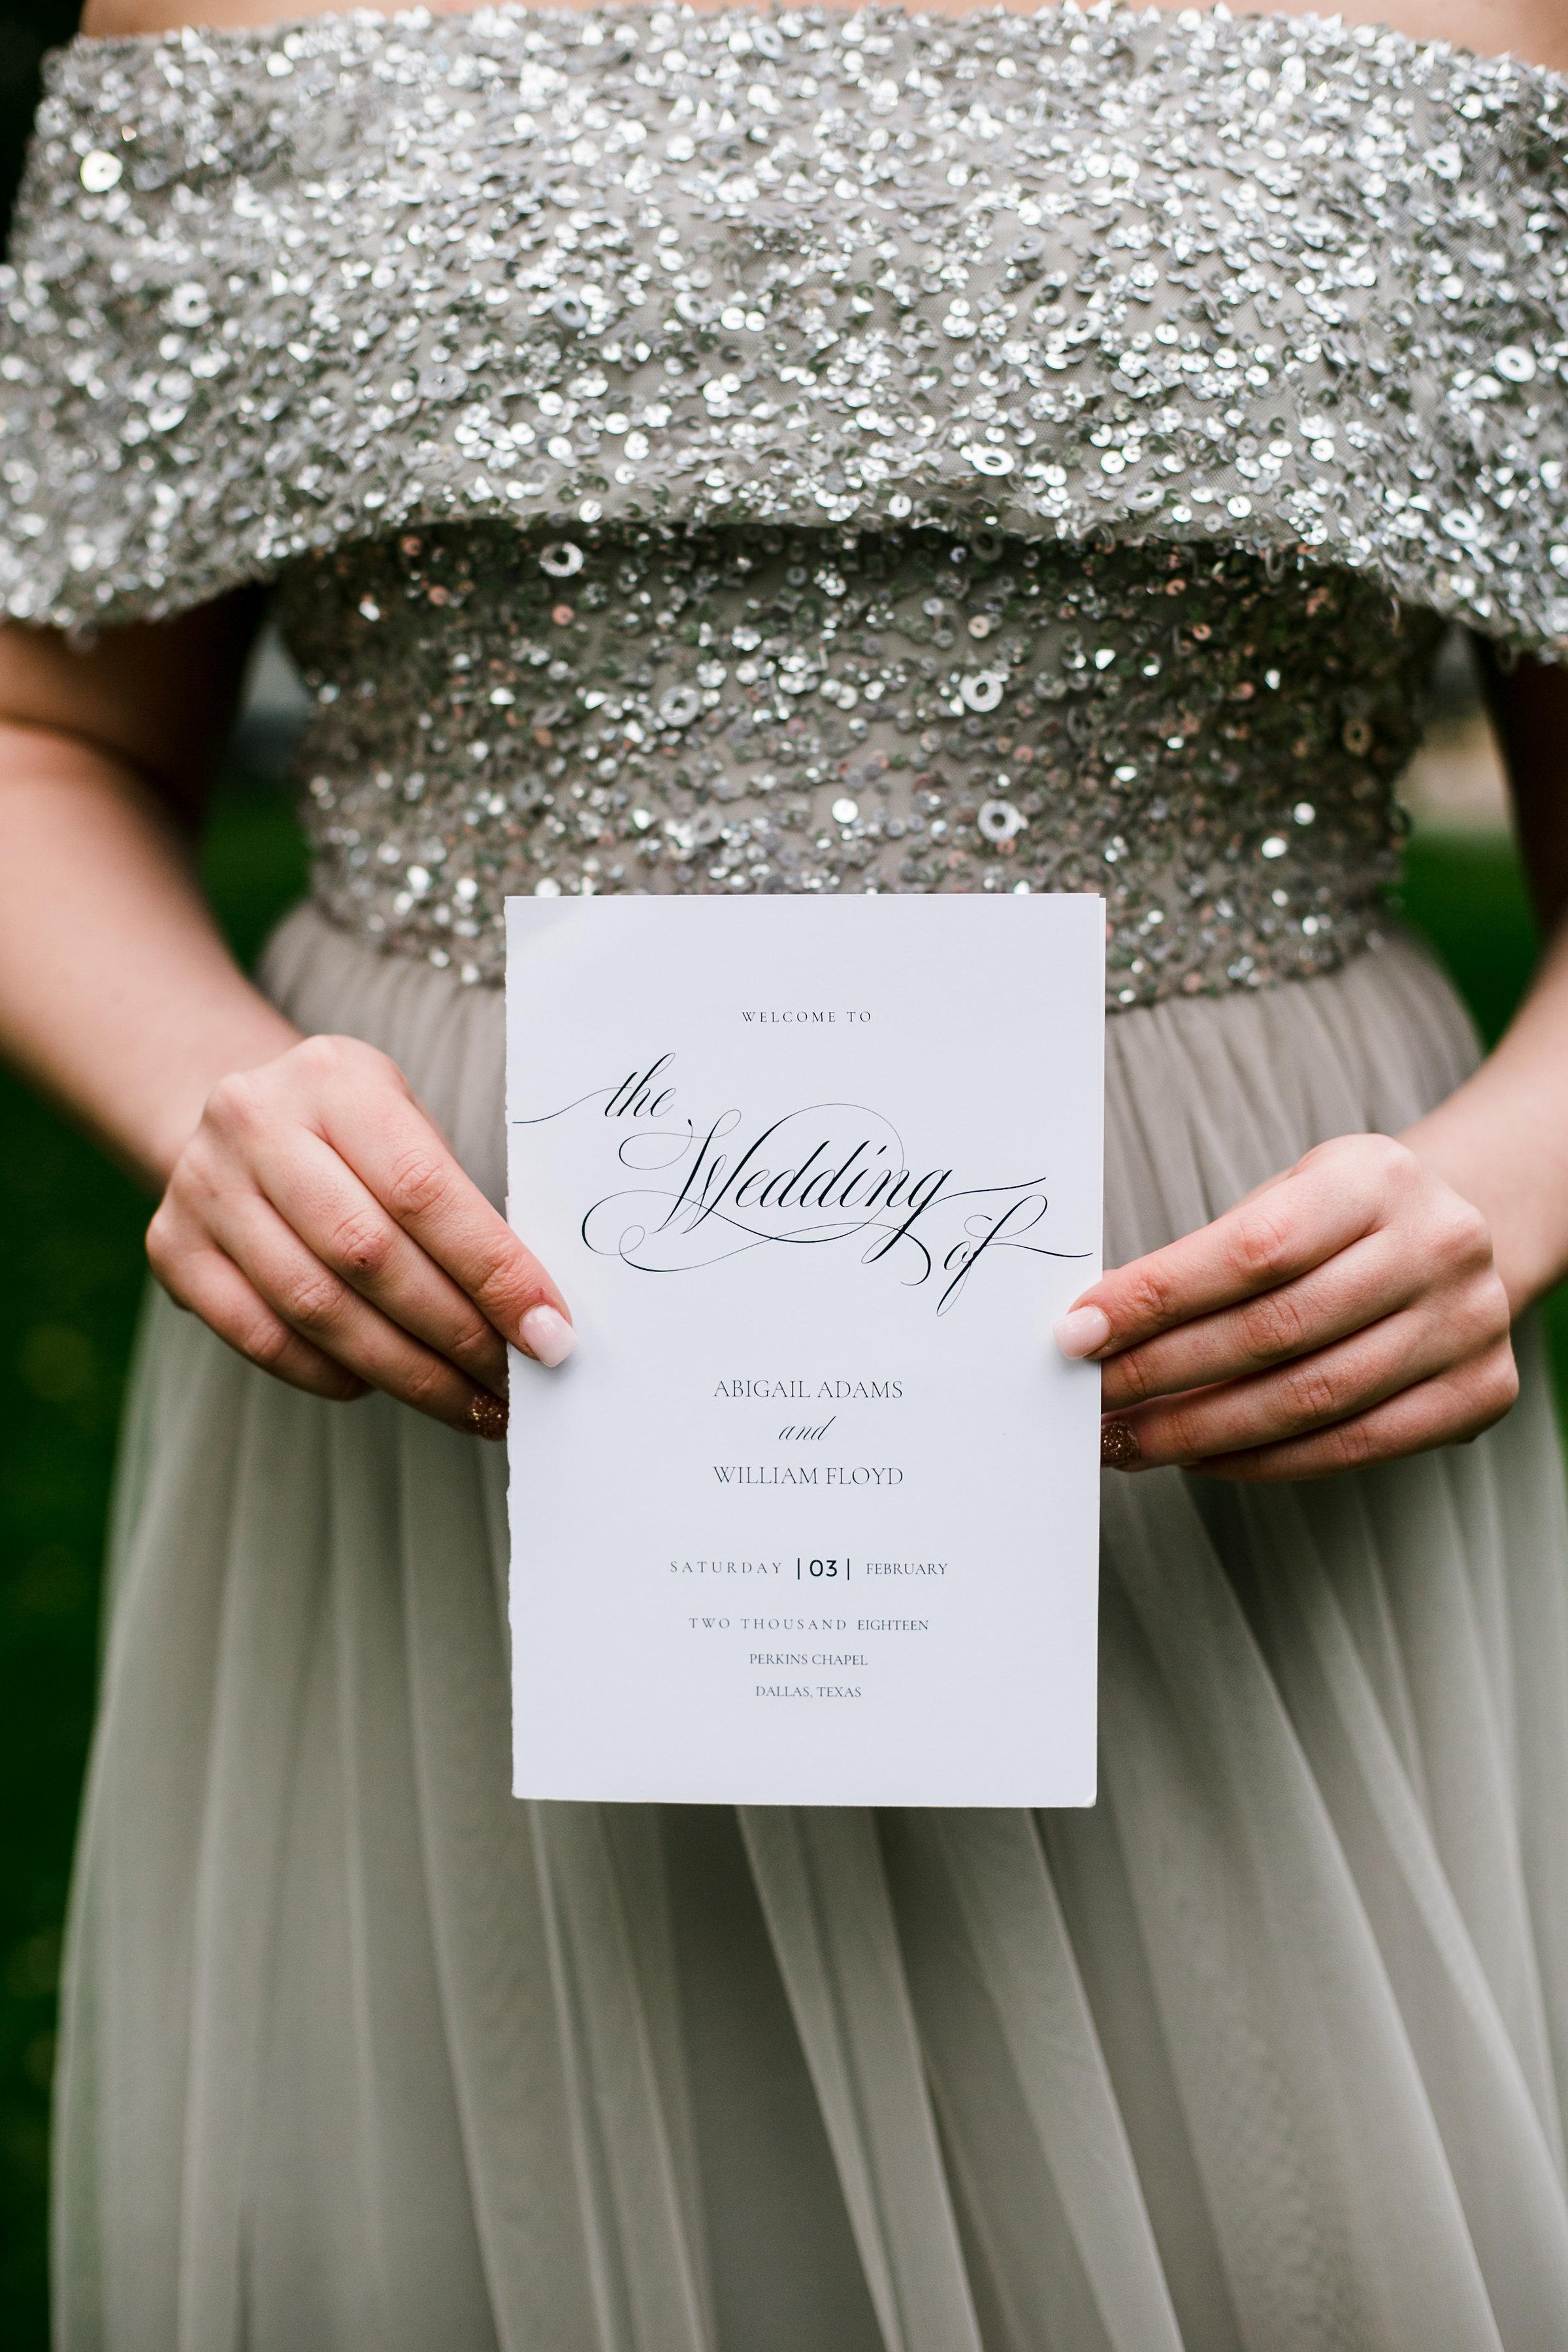 Personalization Details - Dallas, Texas - Winter Wedding - Julian Leaver Events